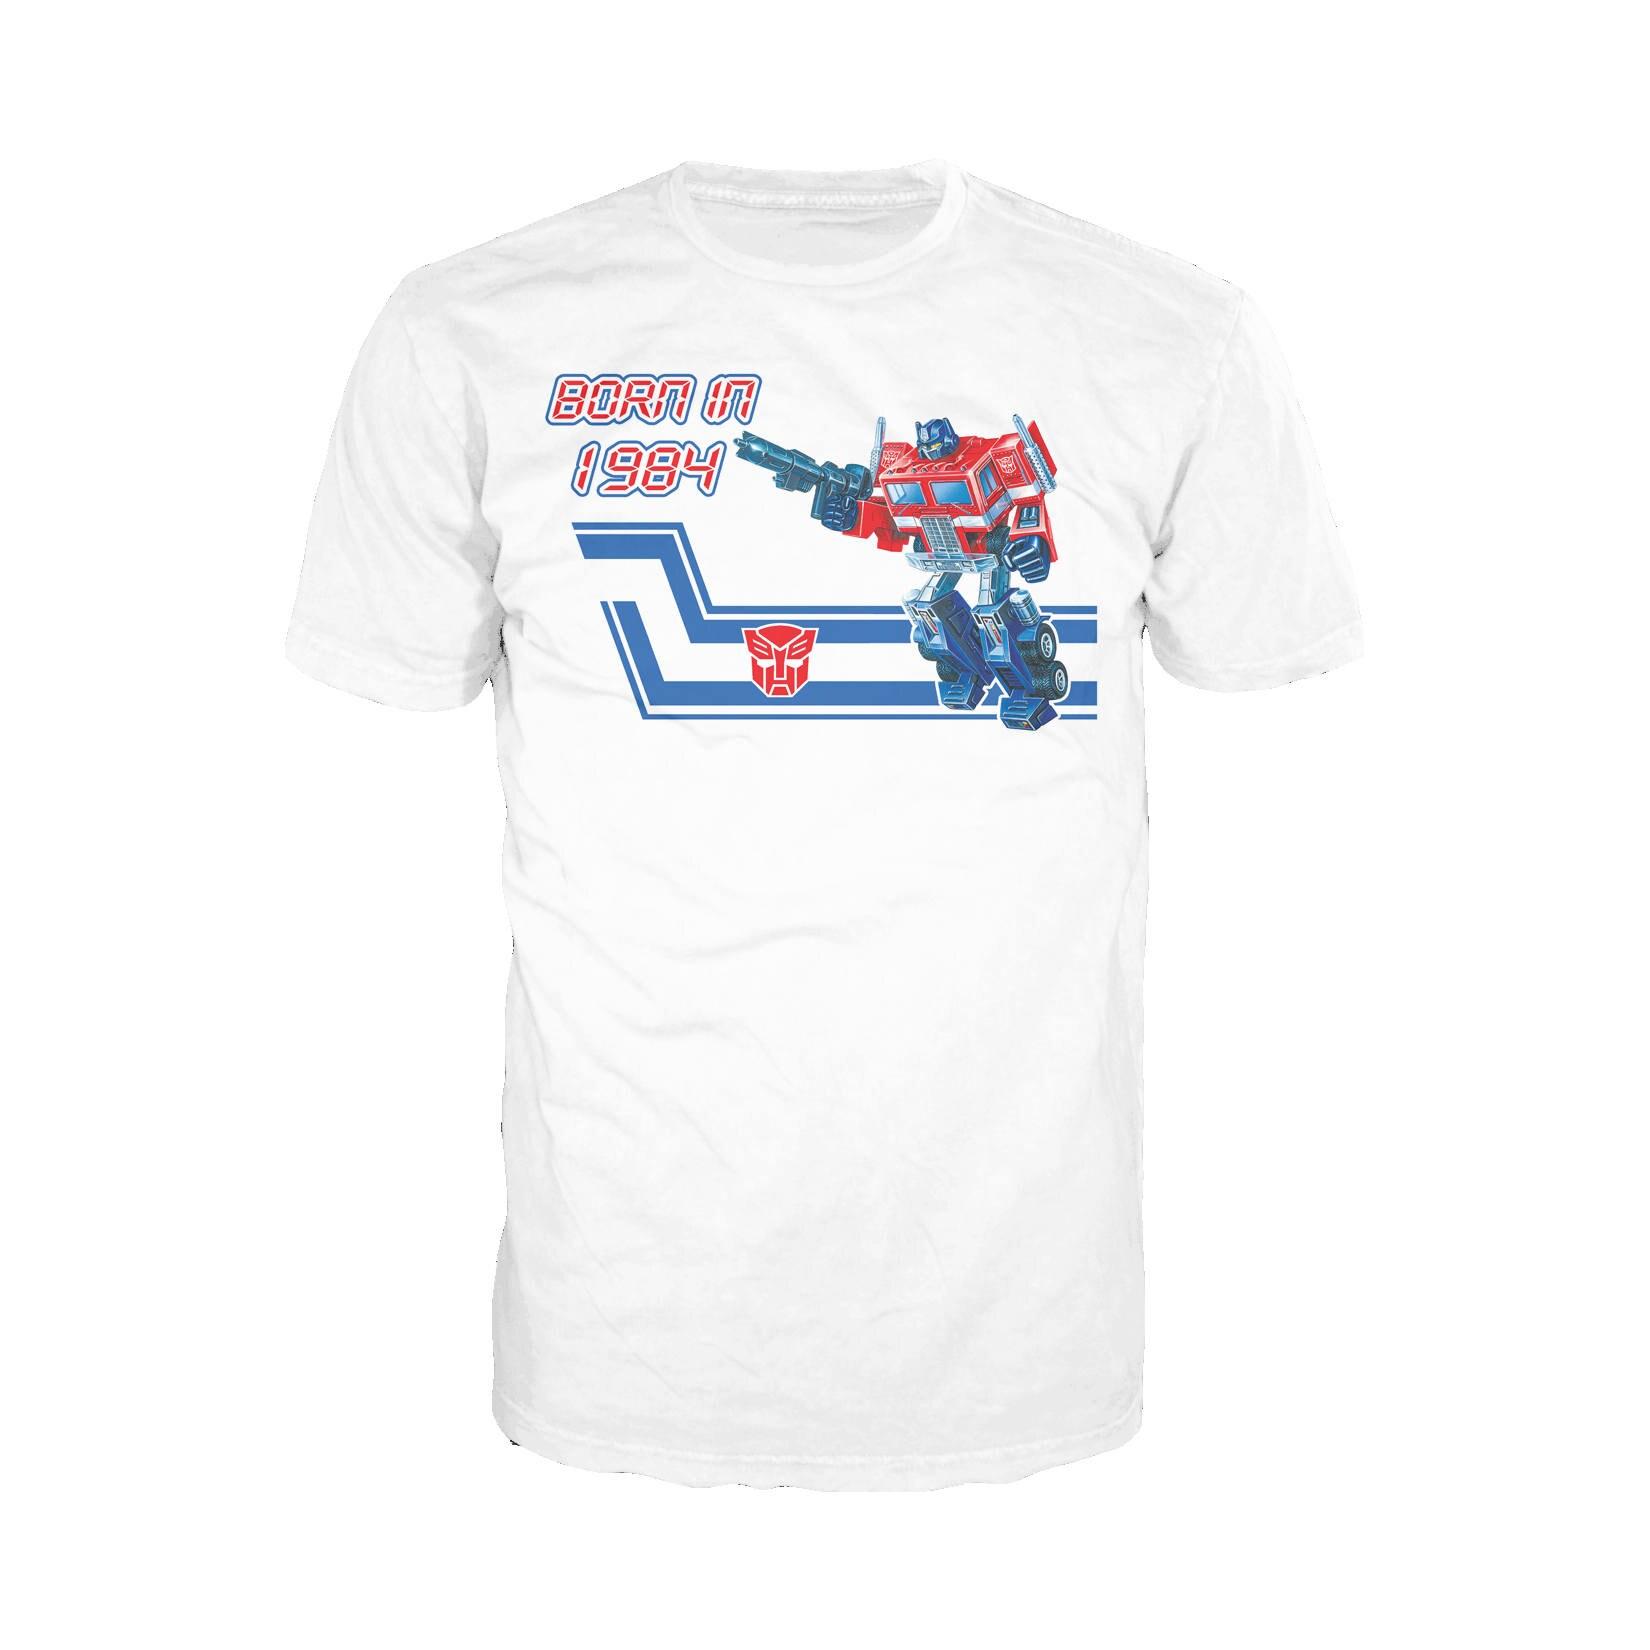 Transformers Born In 1984 Official Hasbro Mens Tshirt (White)